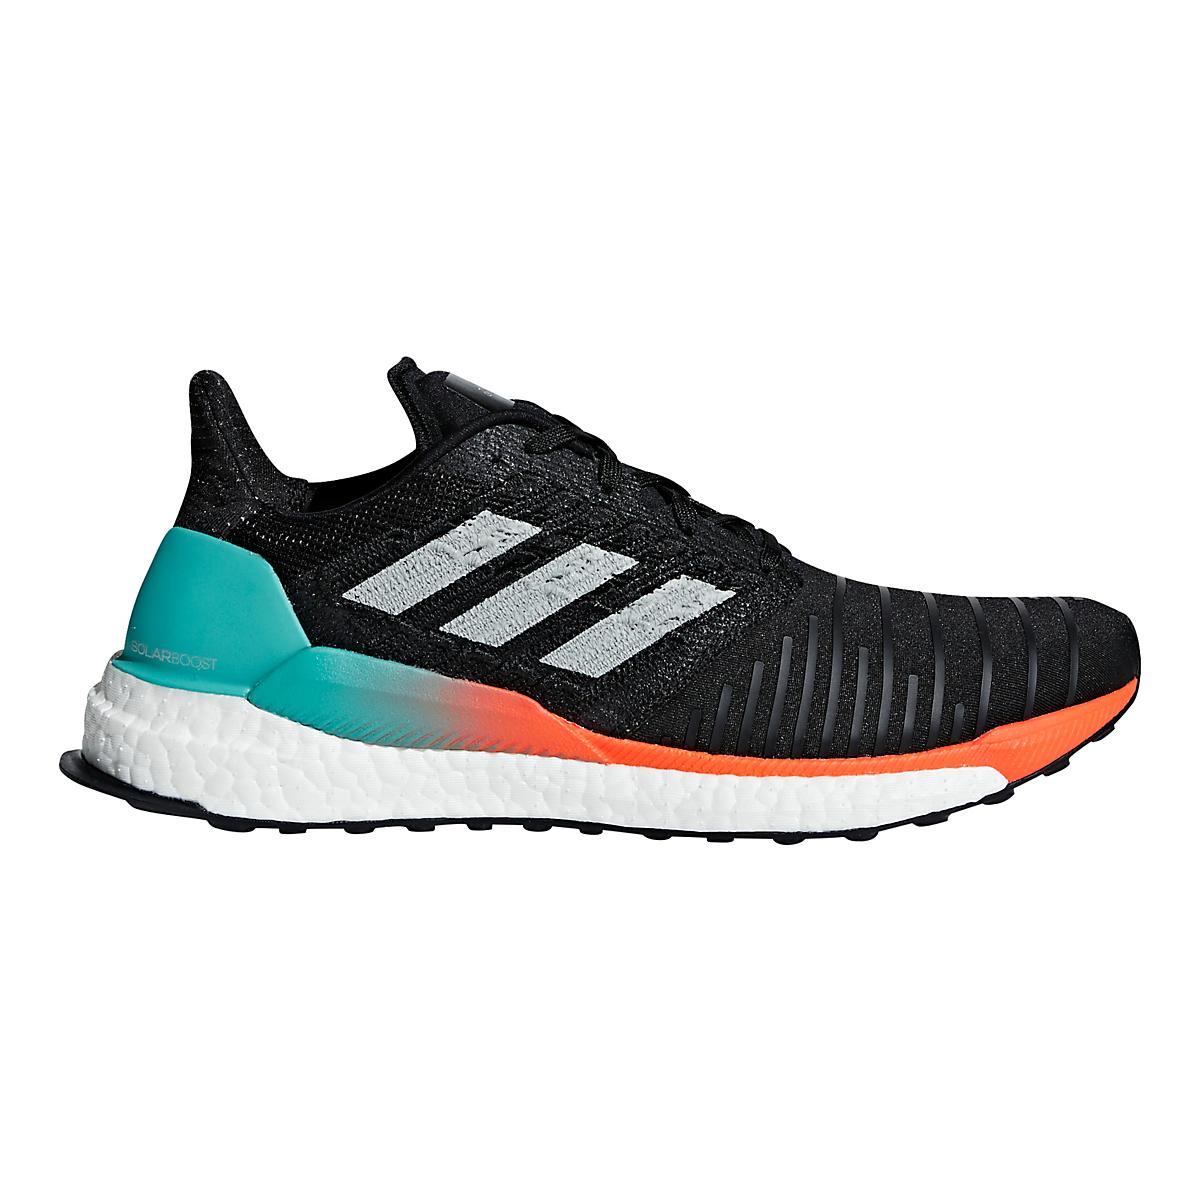 b61e62235a41a Mens adidas Solar Boost Running Shoe at Road Runner Sports